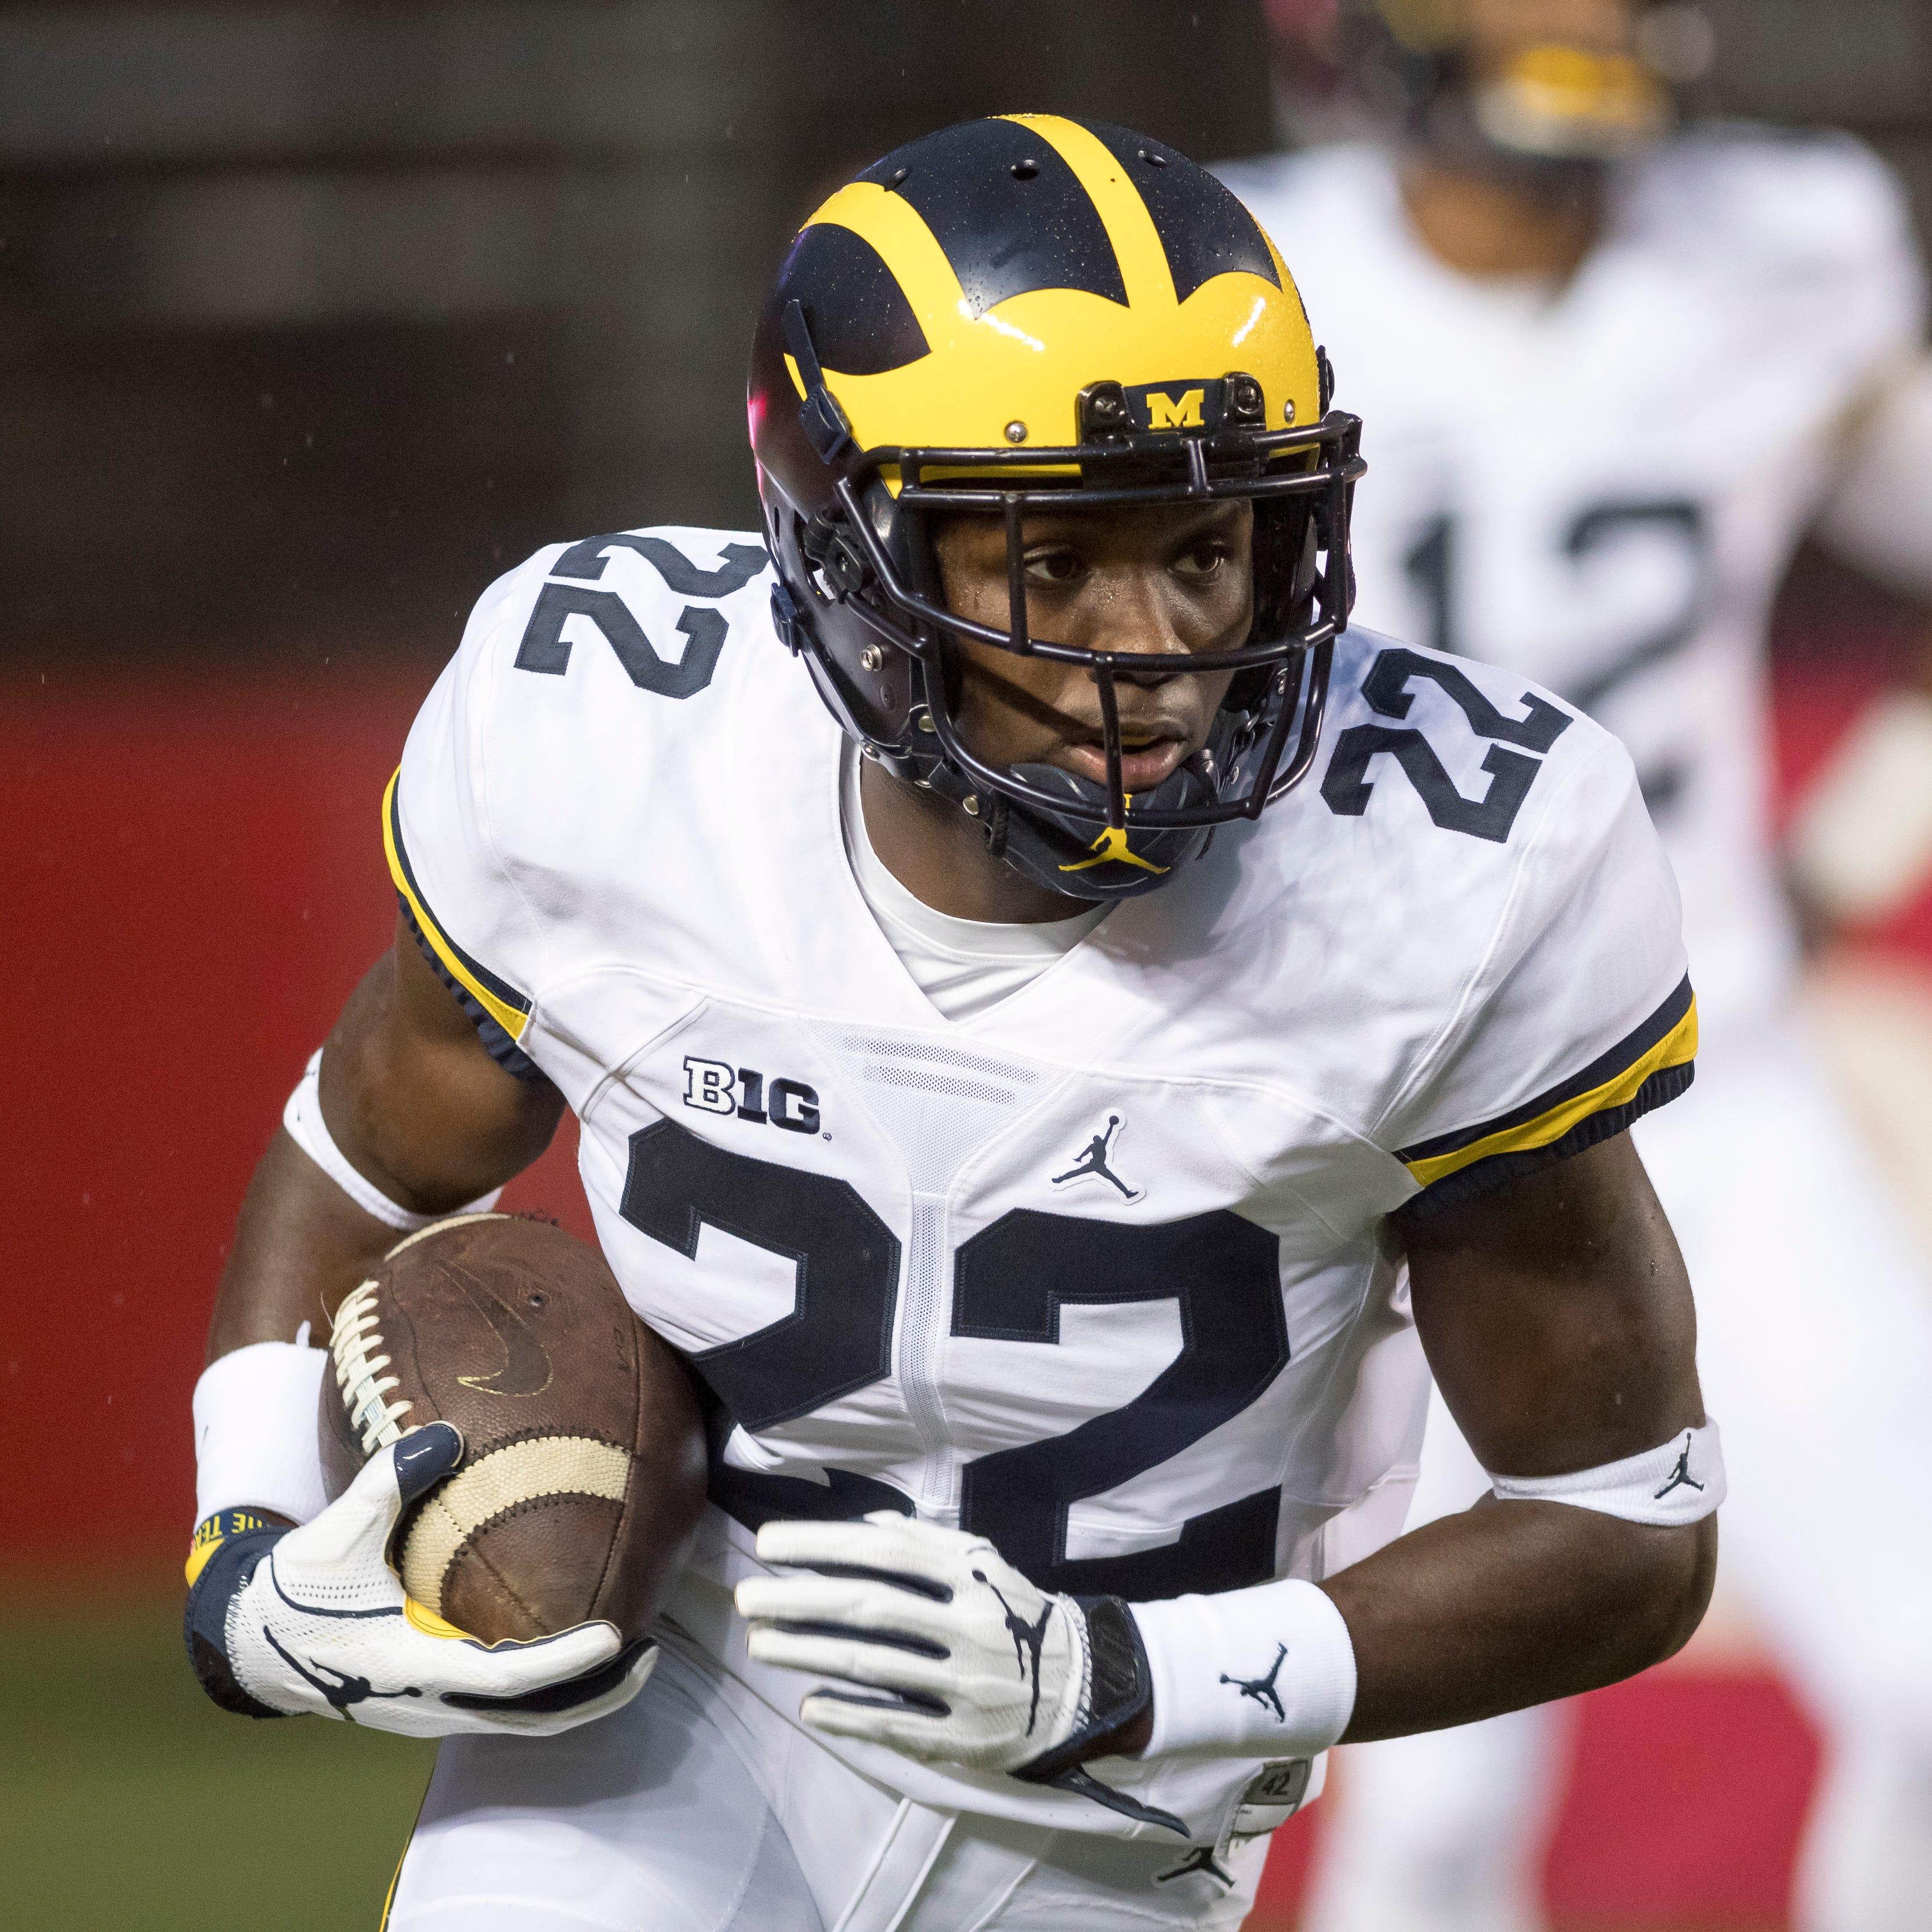 Michigan's David Long, EMU's Maxx Crosby among top 'sleeper' picks in NFL Draft